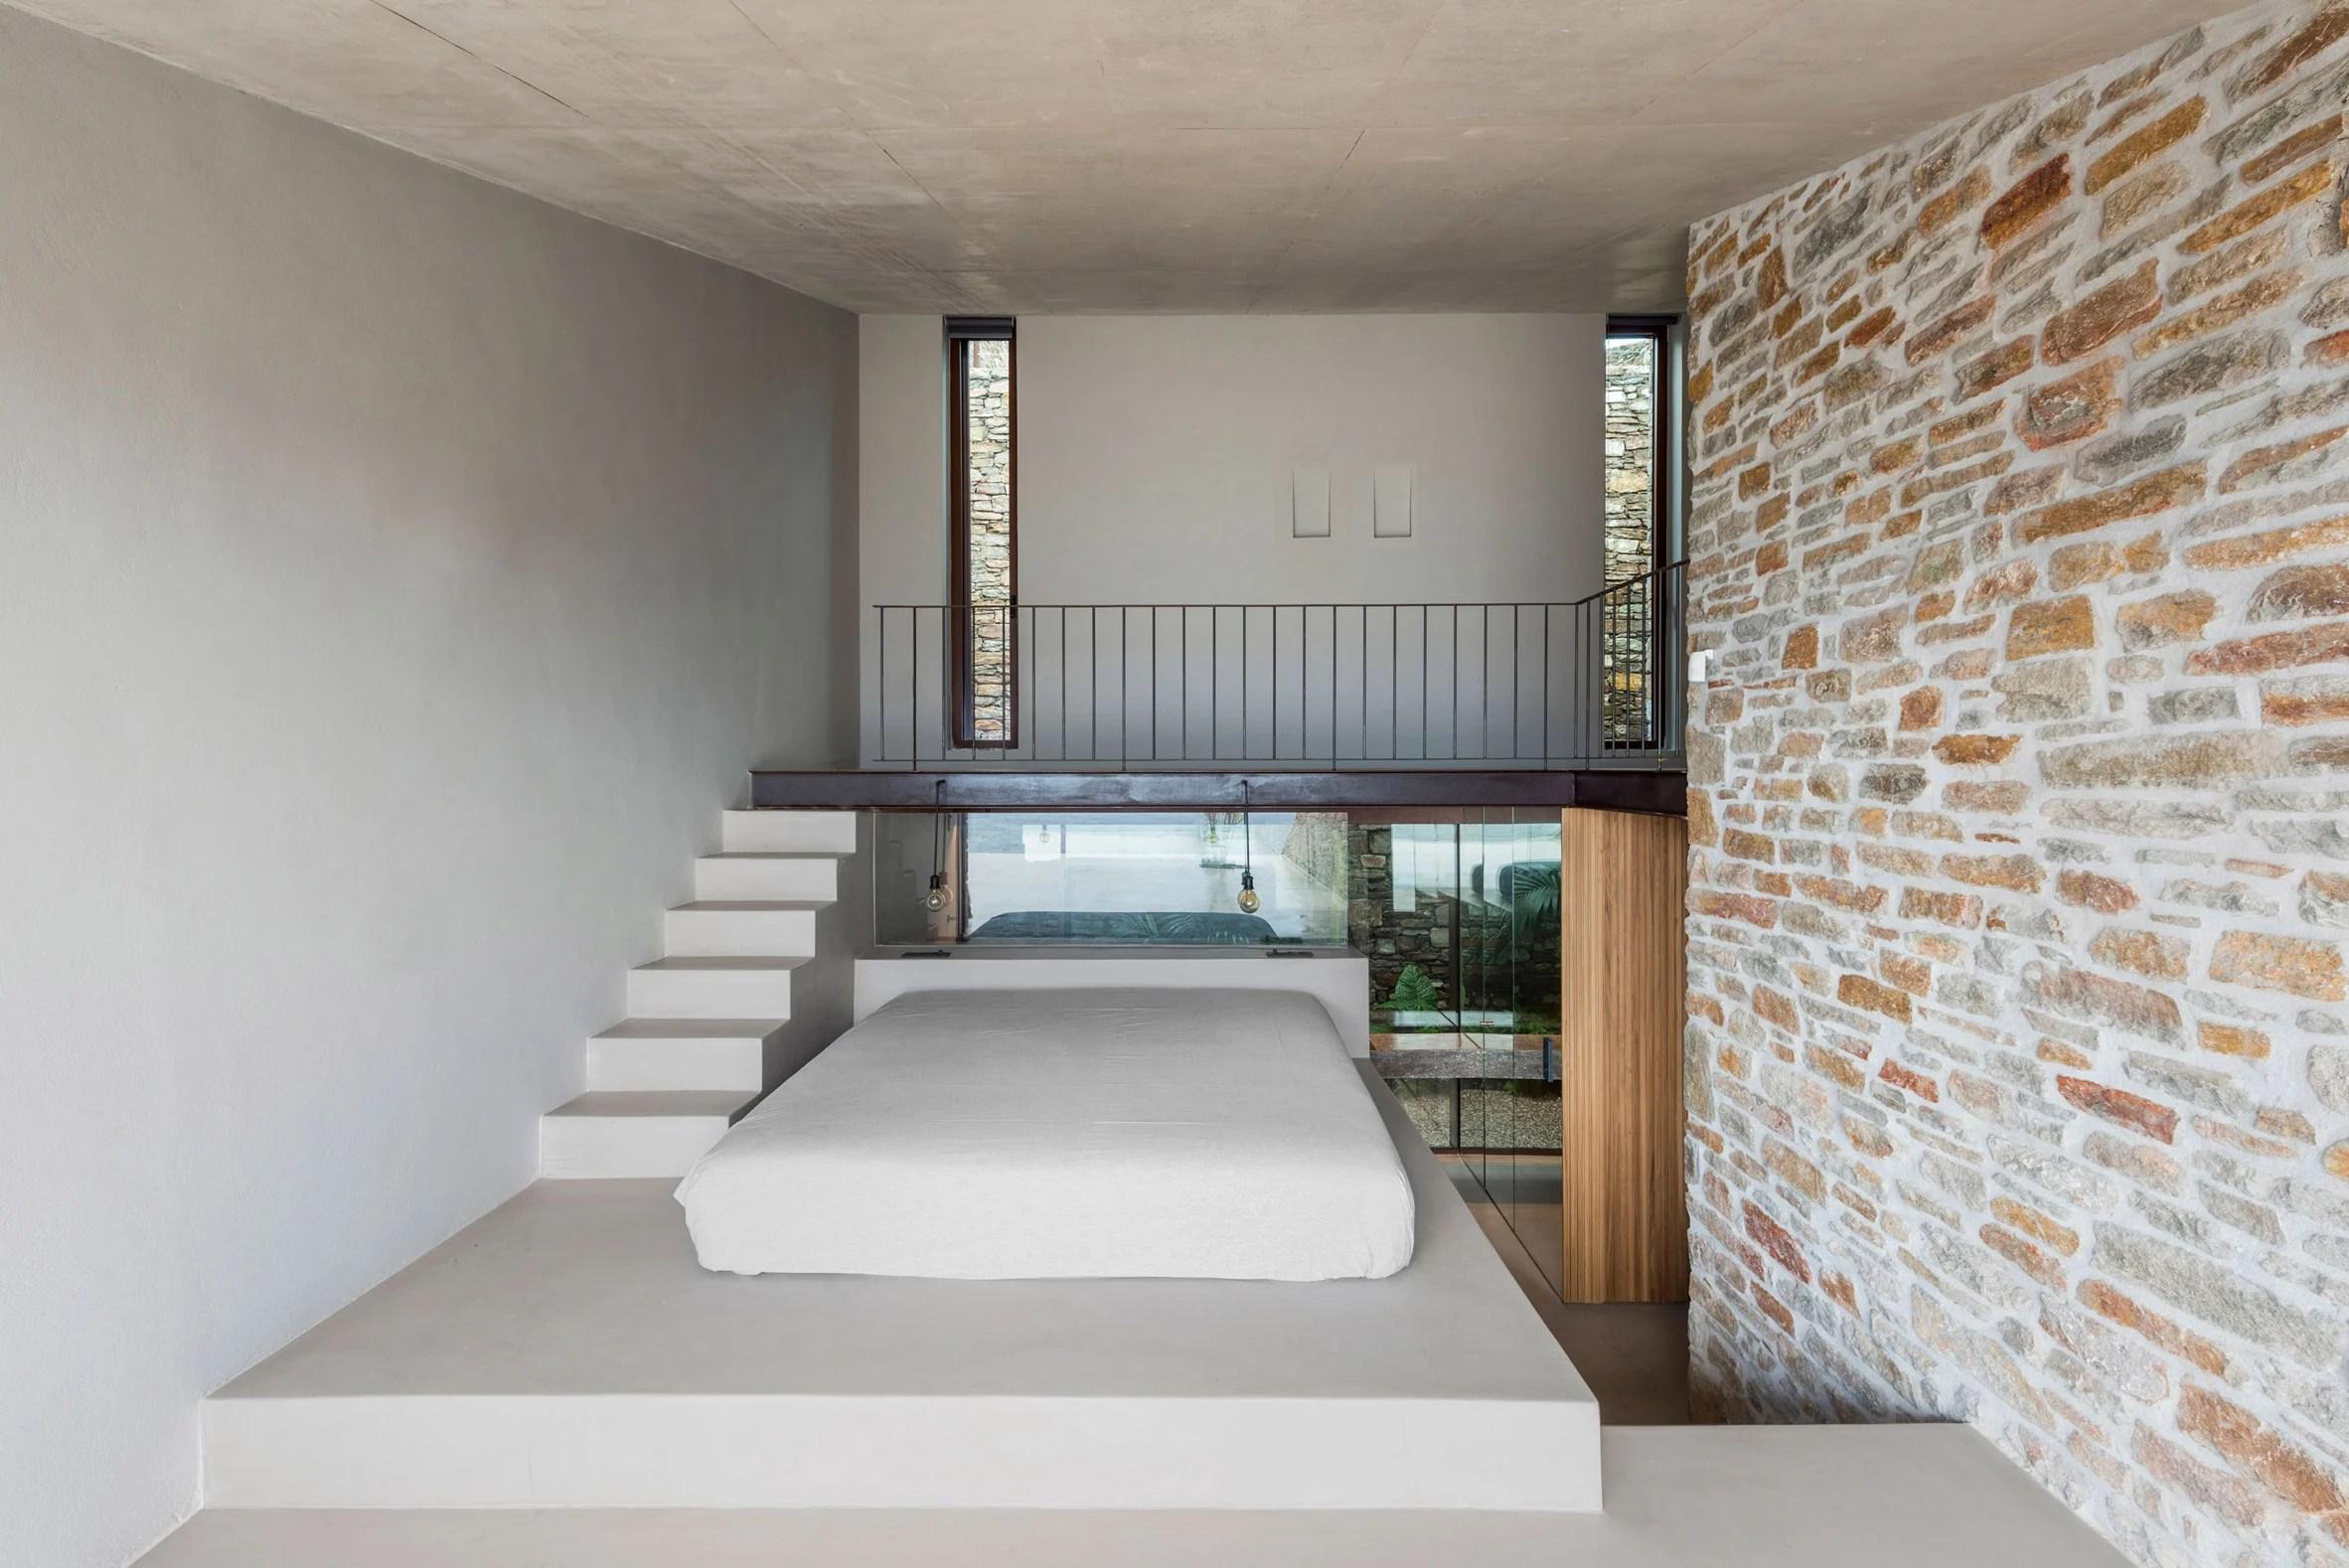 Split level bedroom features a platform bed and mezzanine